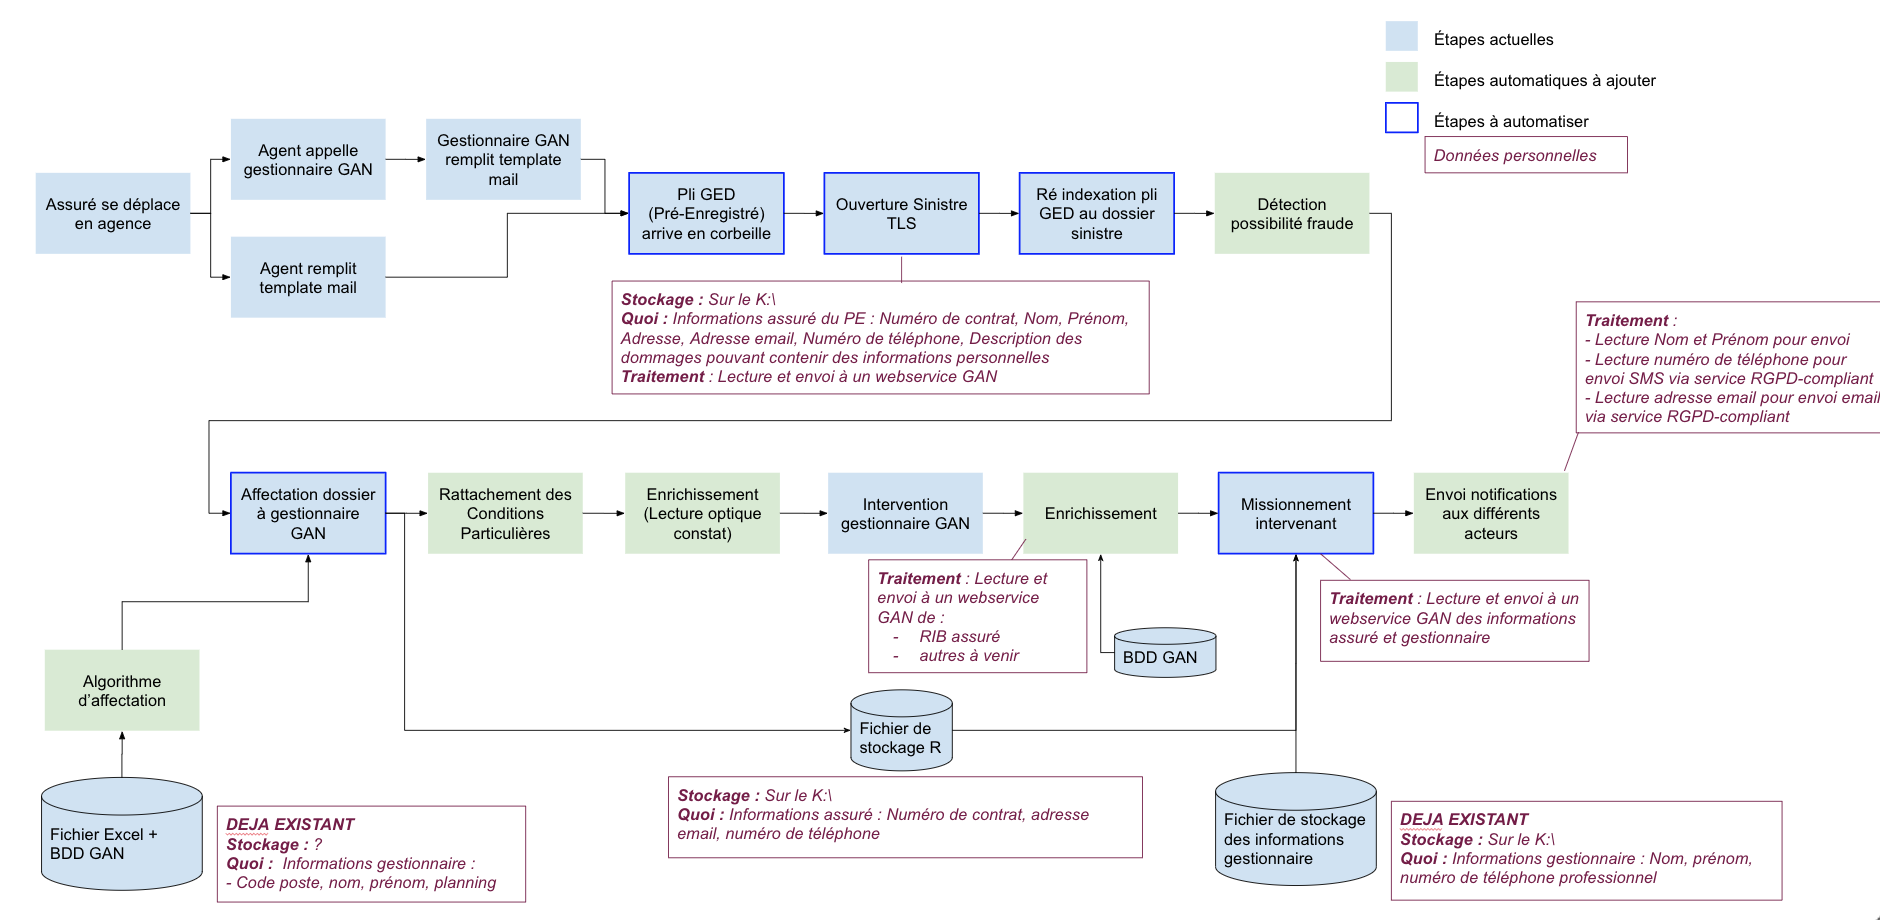 Schéma du process